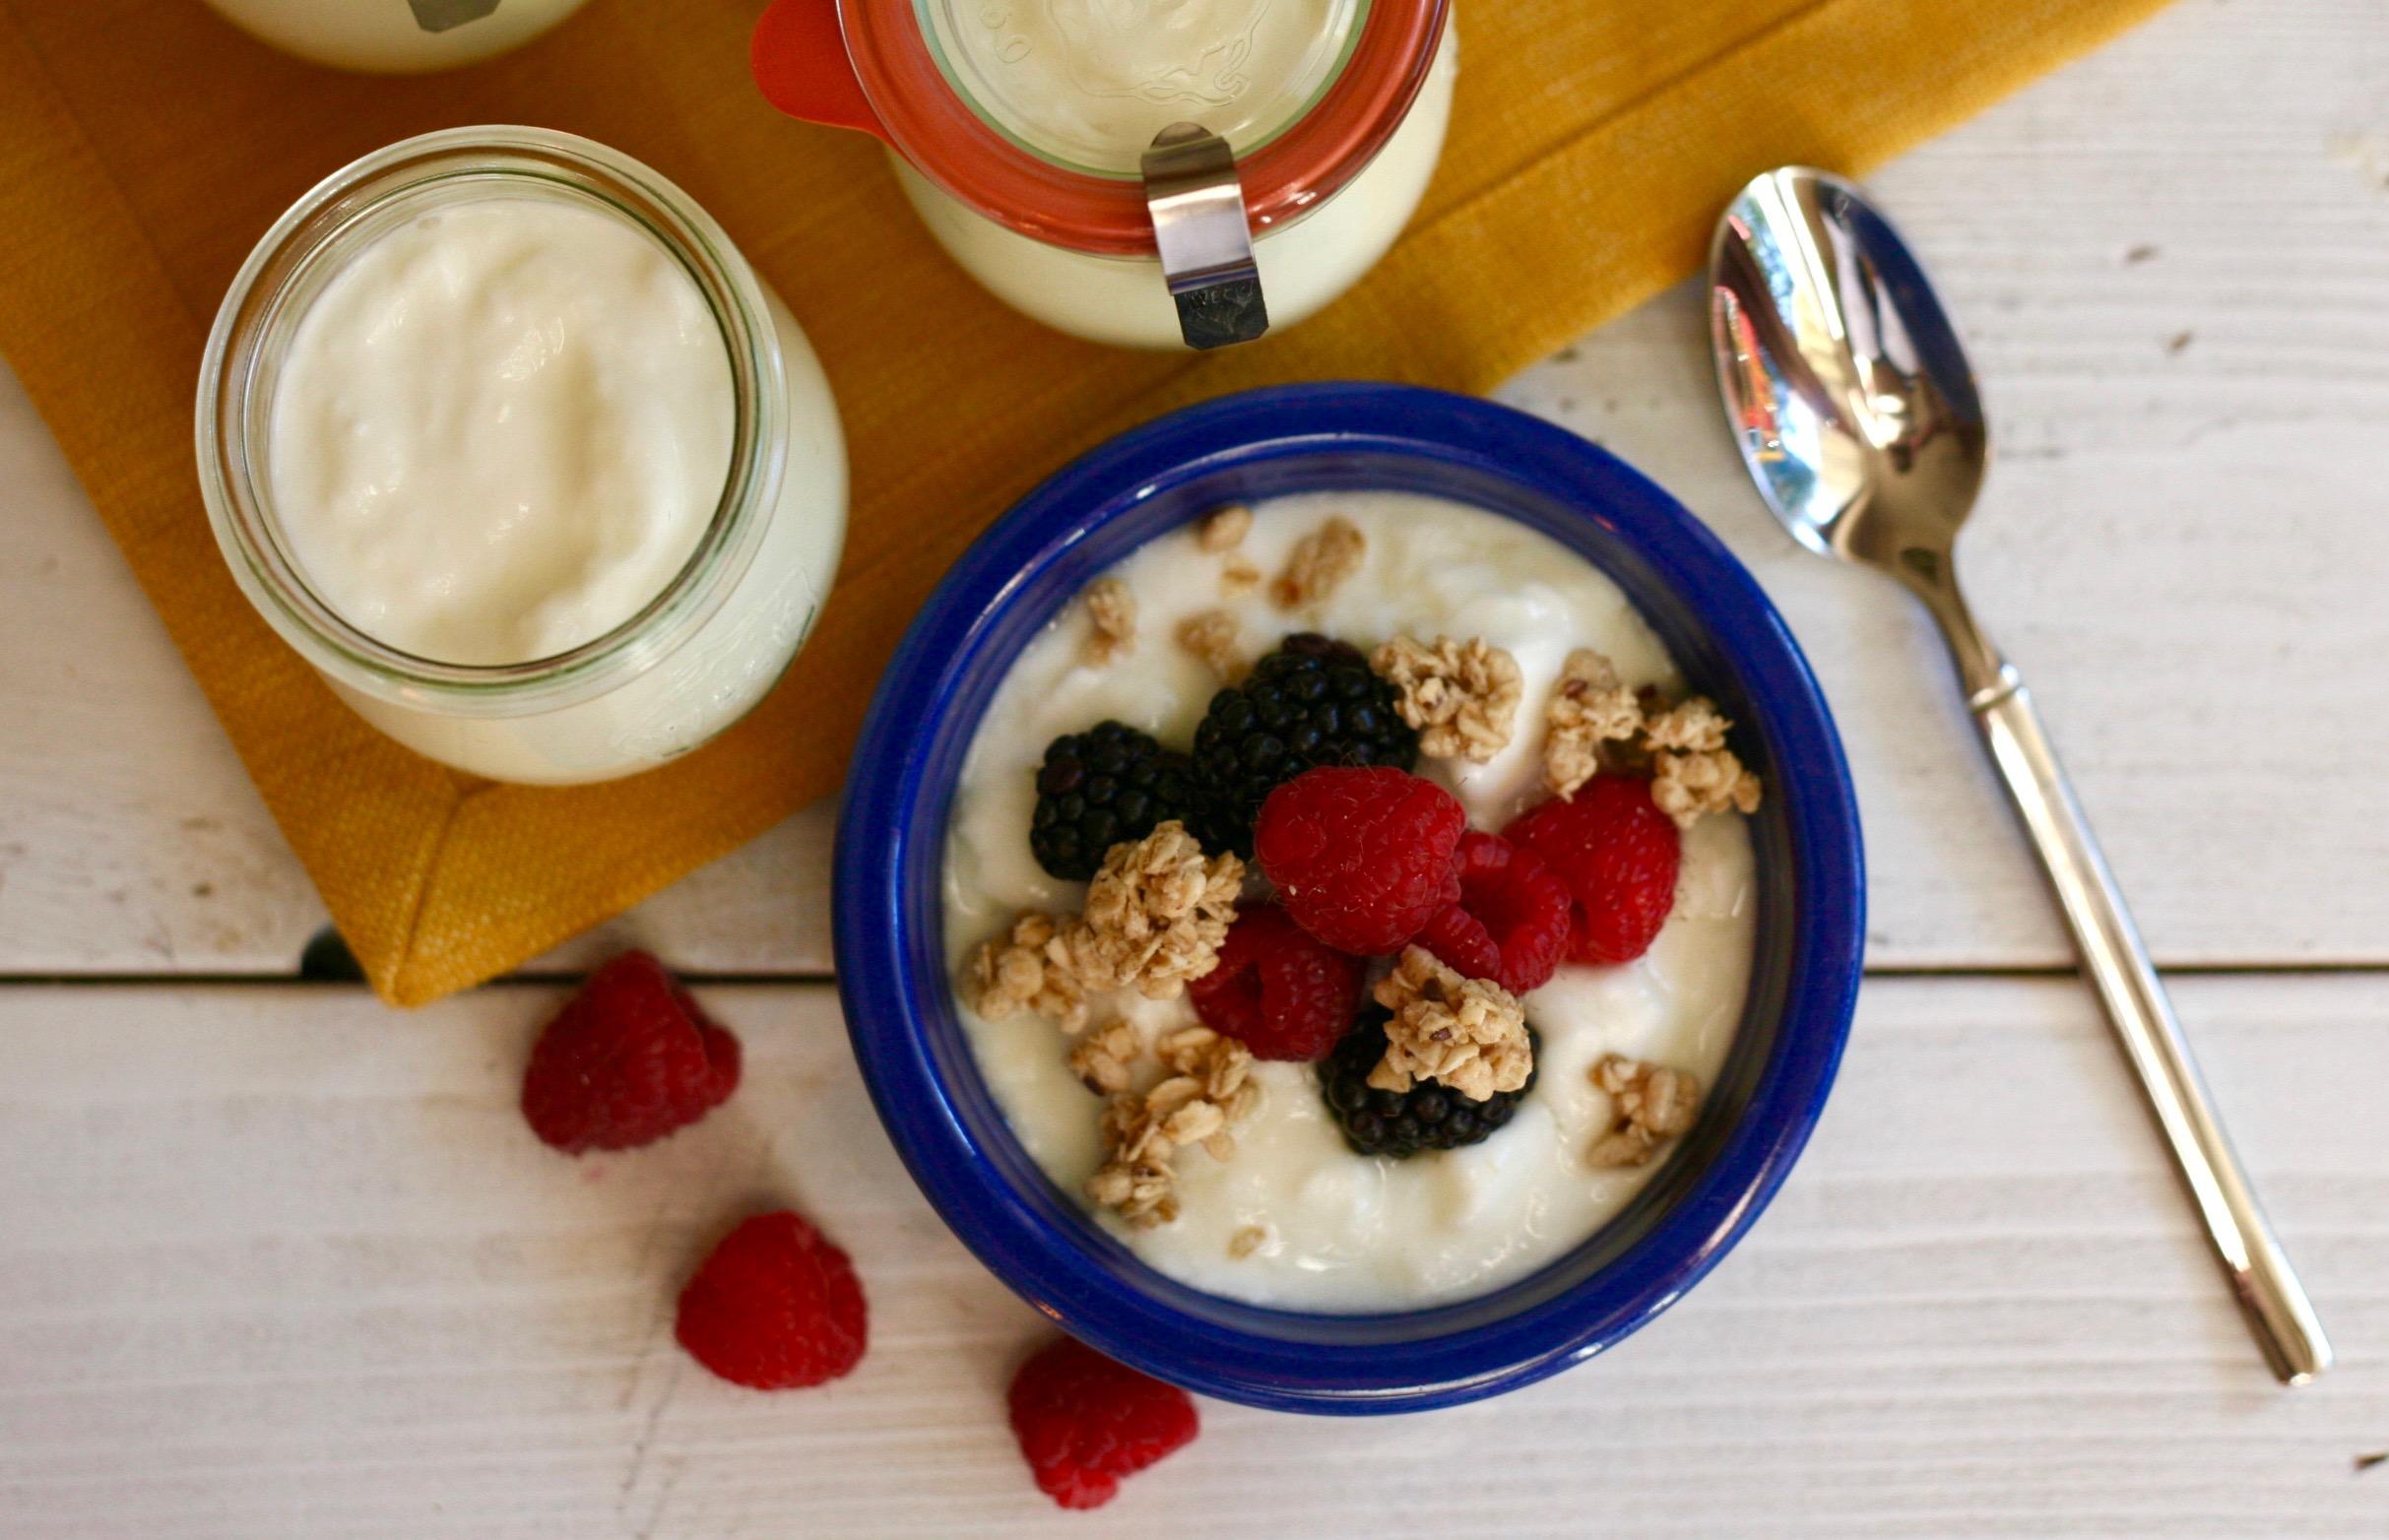 Traditional Homemade Yogurt image